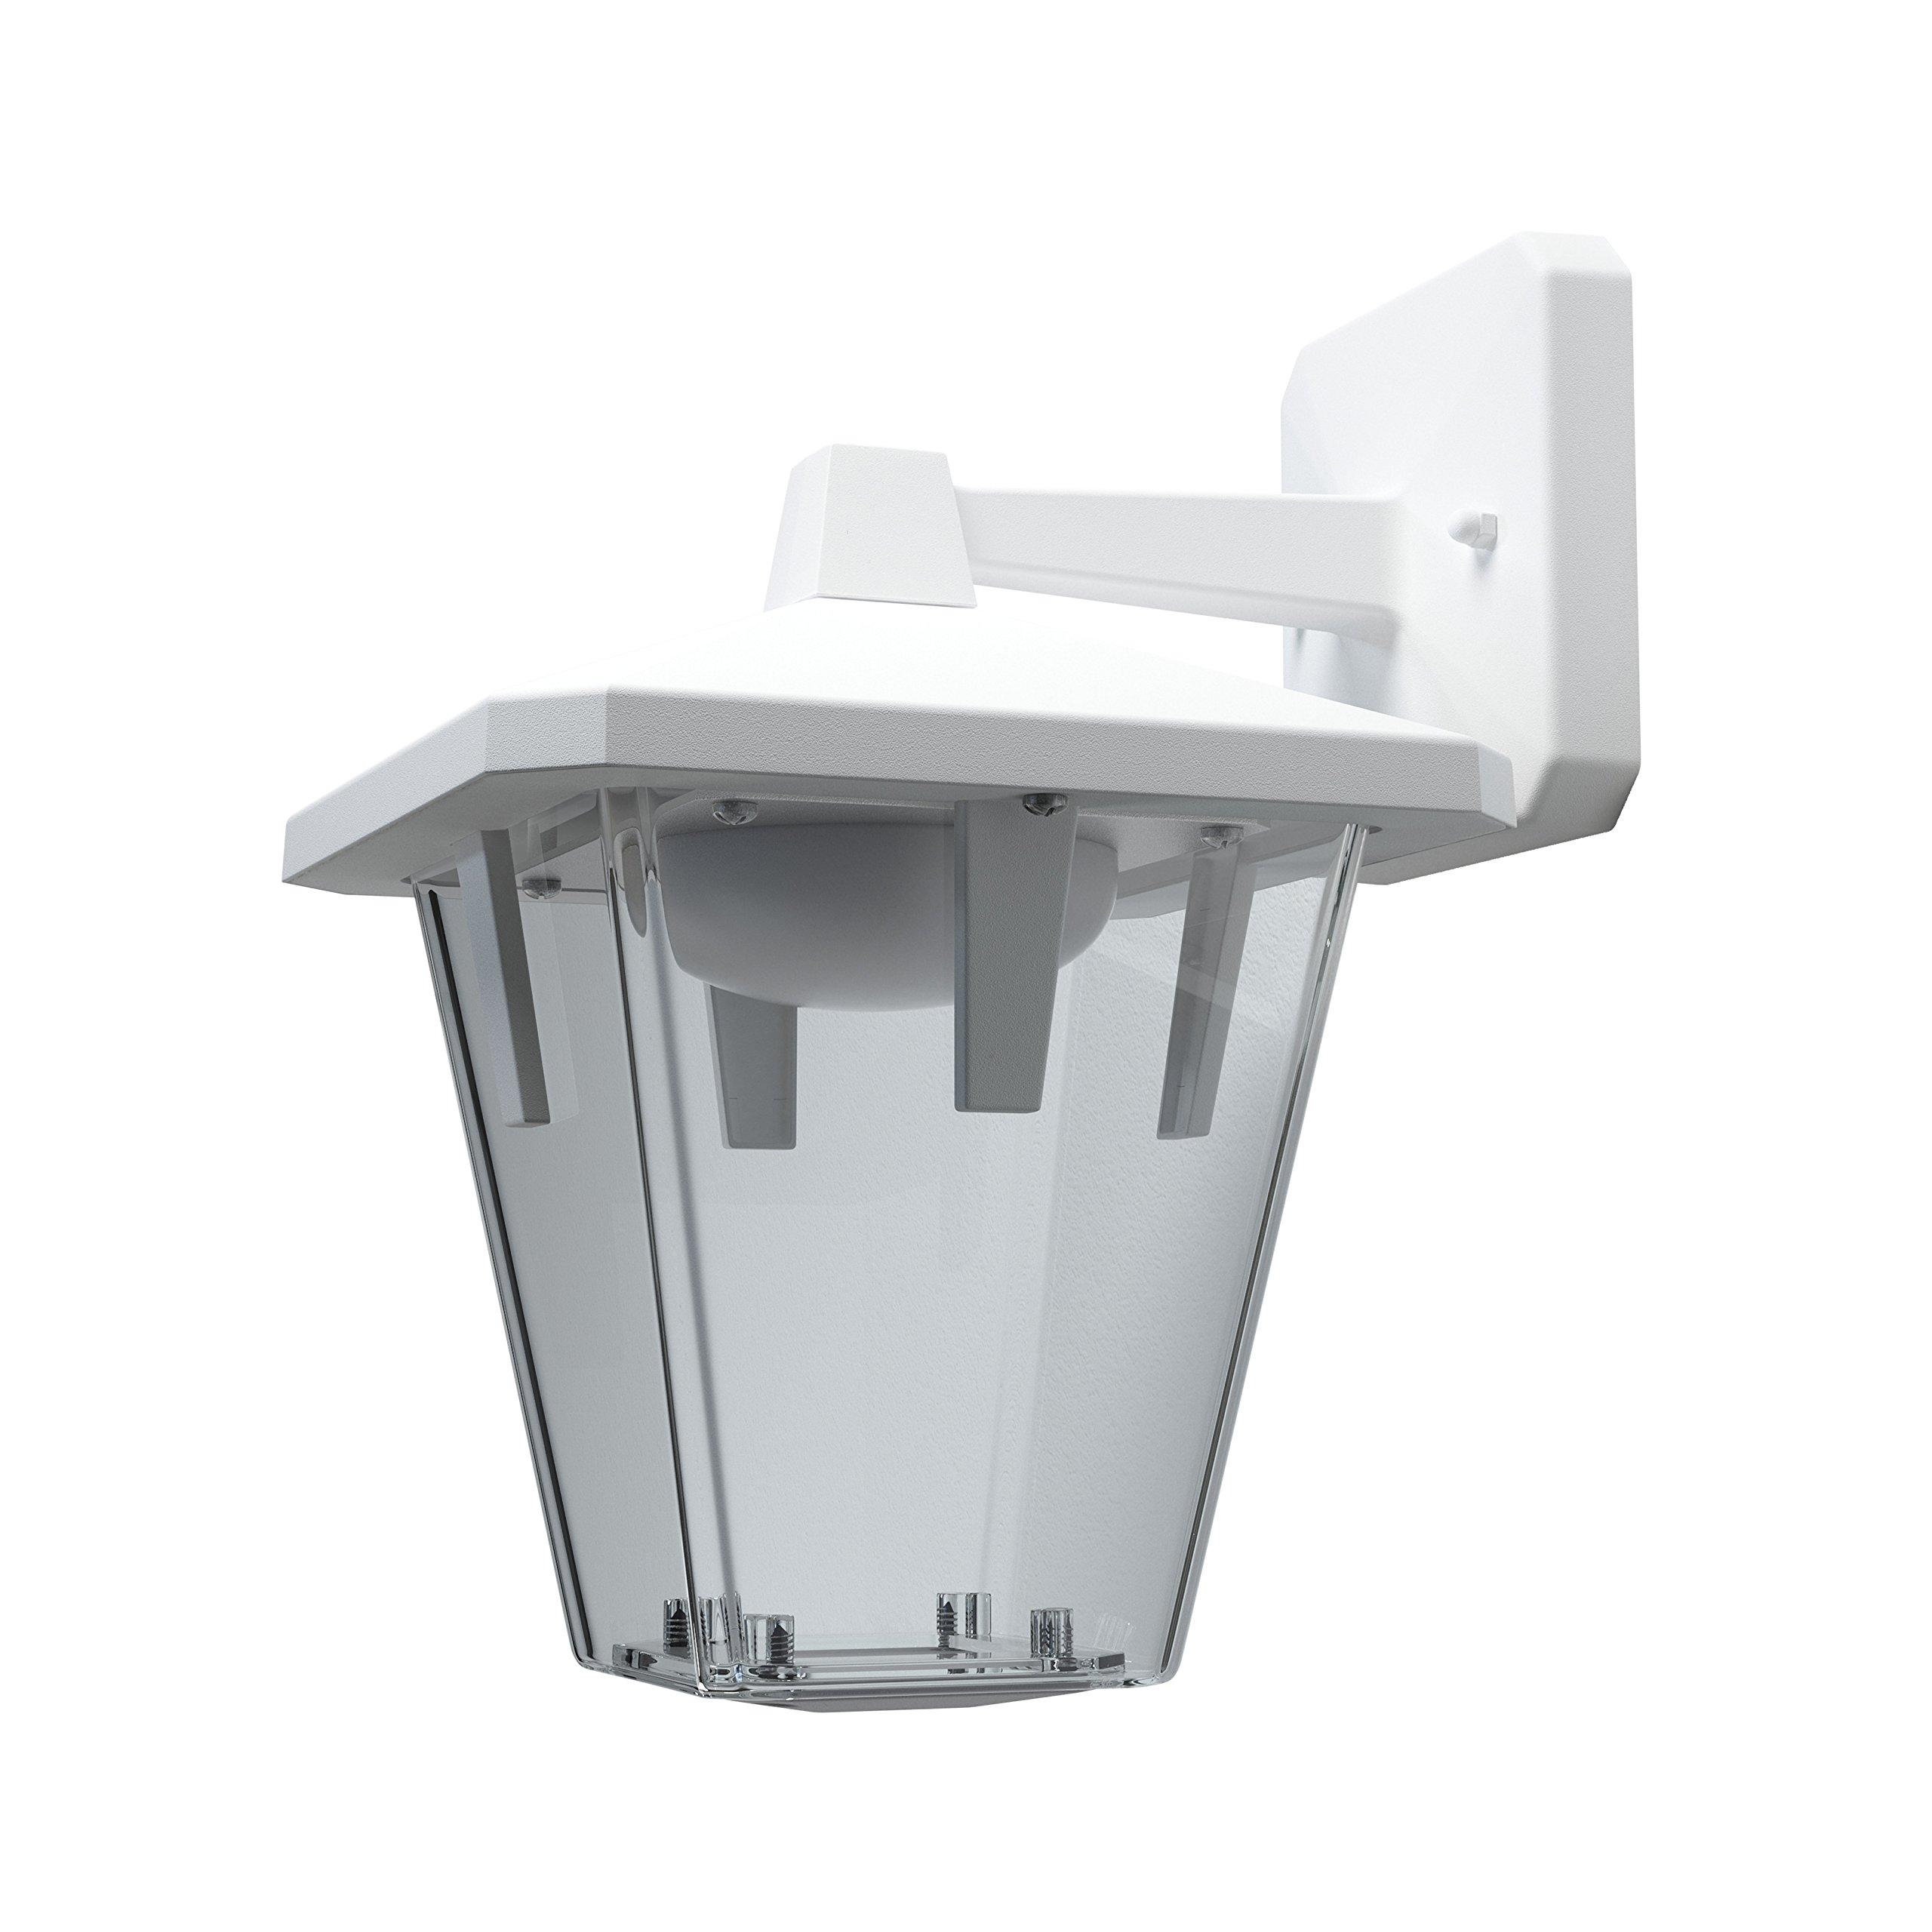 Osram EnduraスタイルランタンクラシックダウンLEDウォールライト屋外照明、暖かい白、10ワット